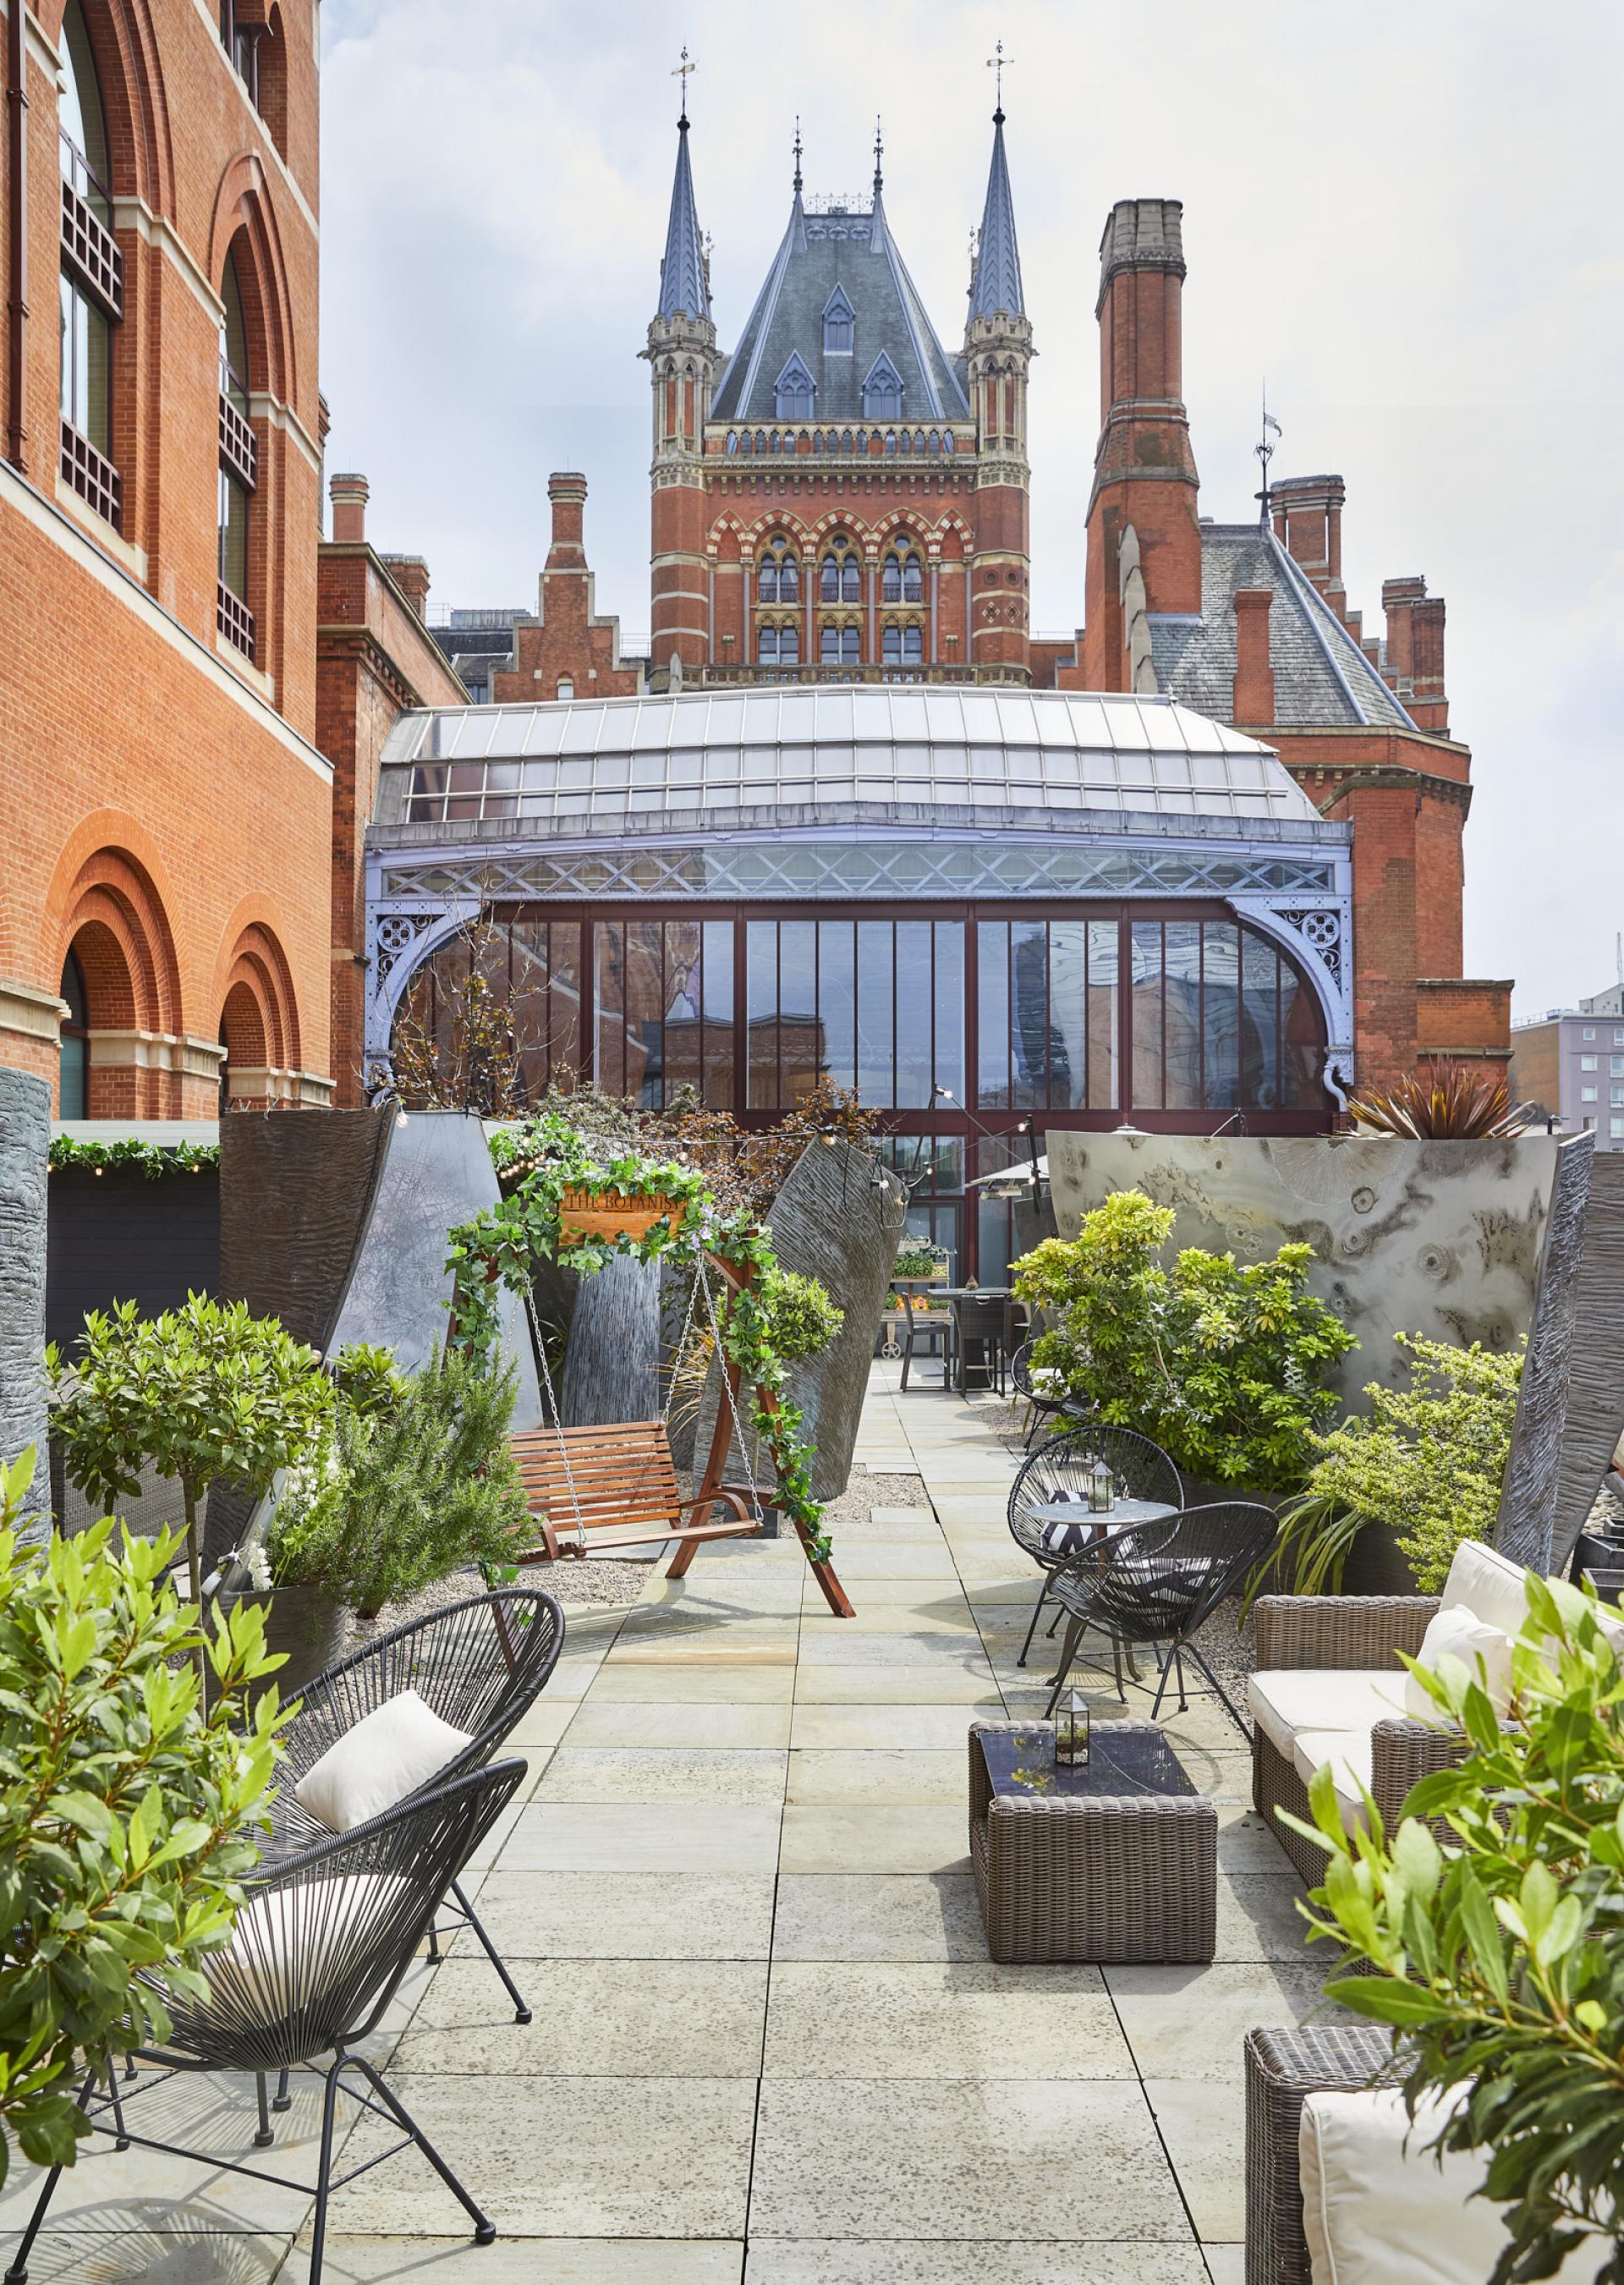 Summer in London: The Botanist roof terrace